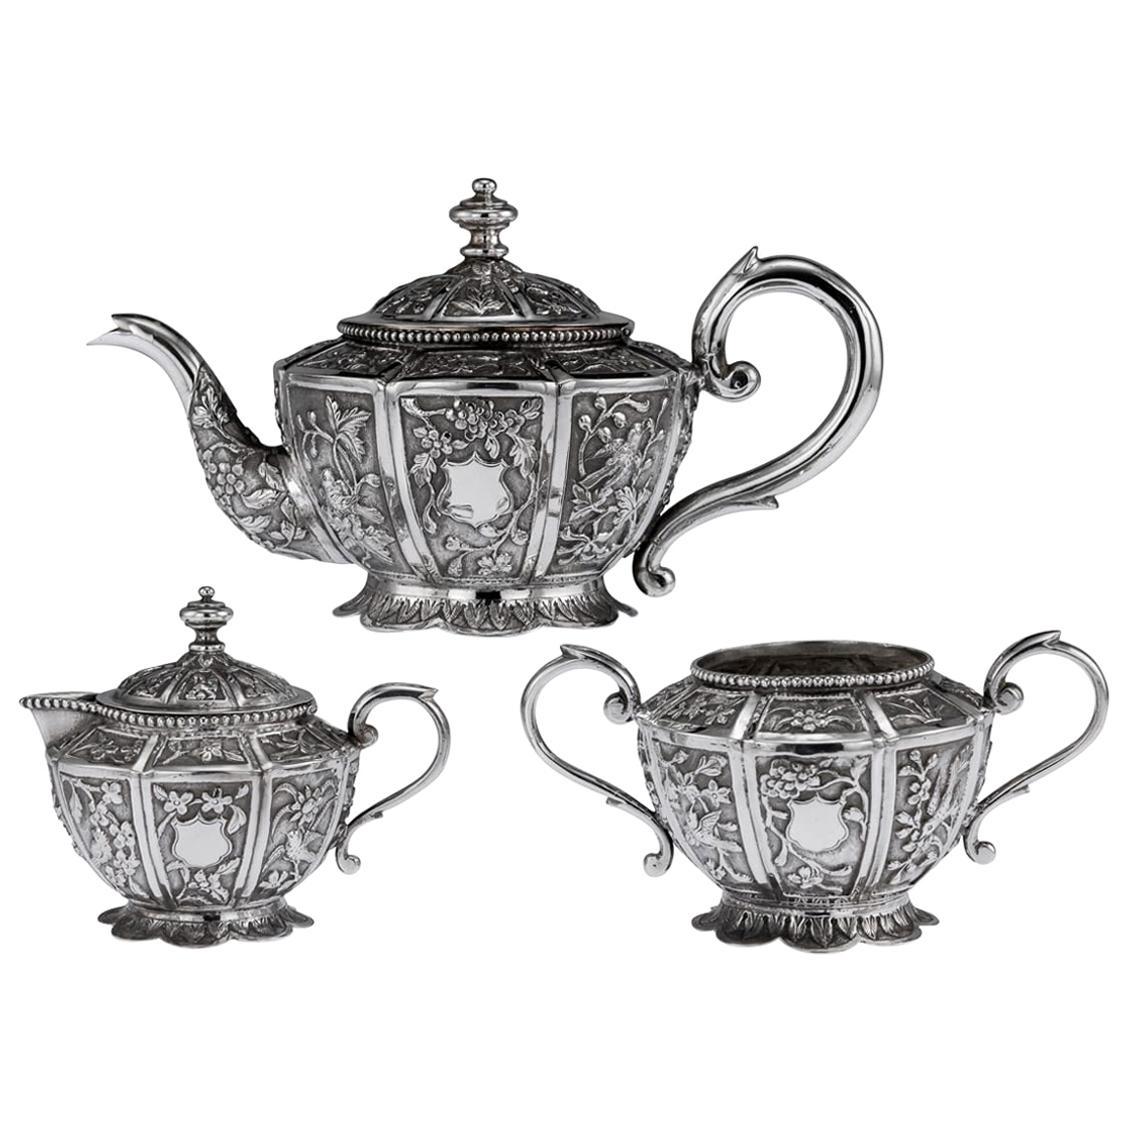 20th Century South Asian Solid Silver Tea Set, Cambodia / Malaysia, circa 1910